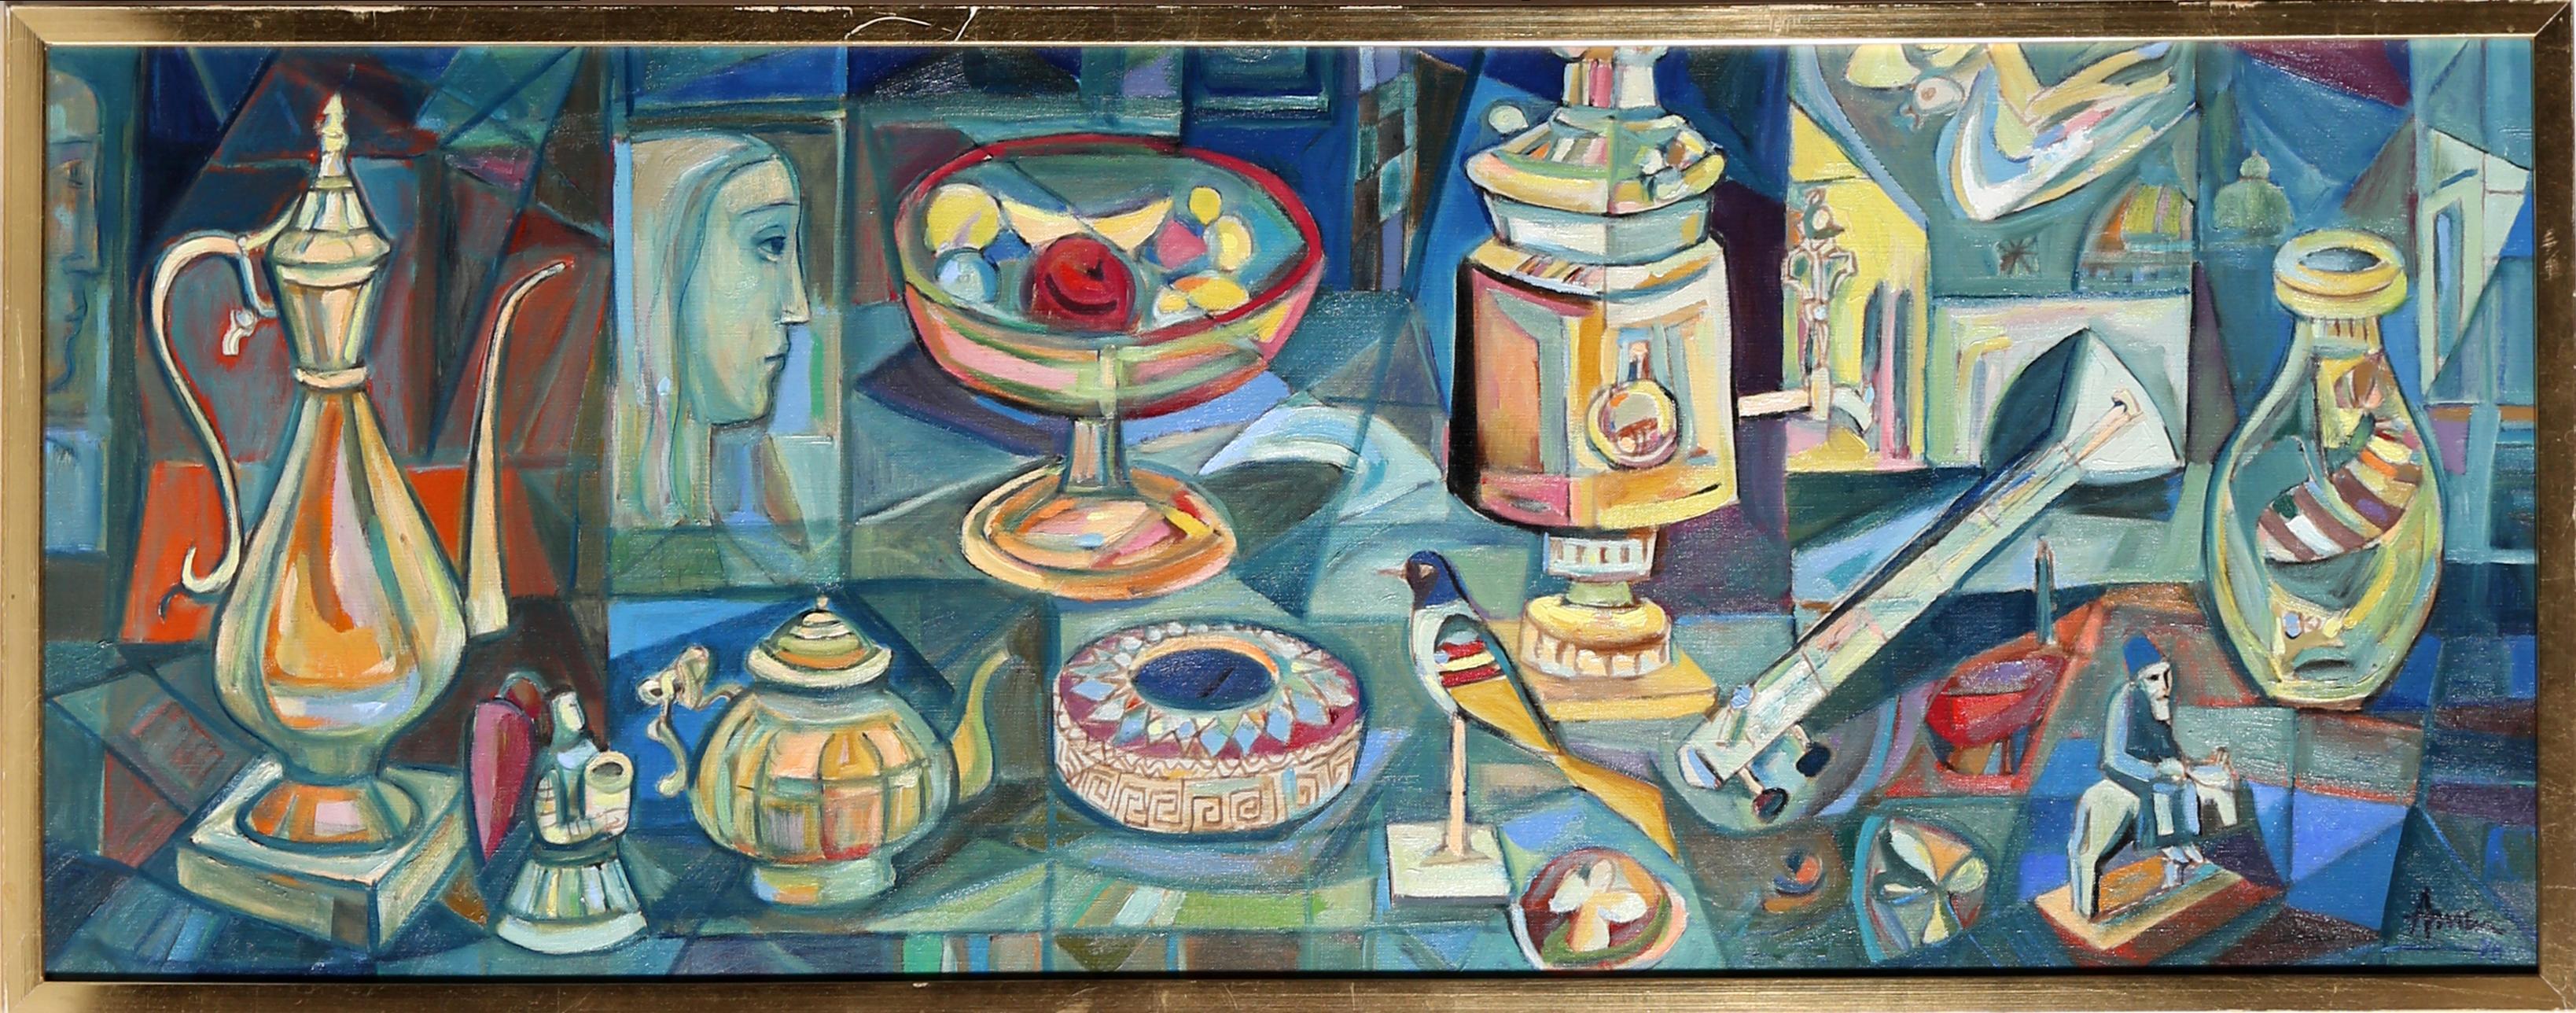 Objet d'Art, 1978, Painting by Irving Amen